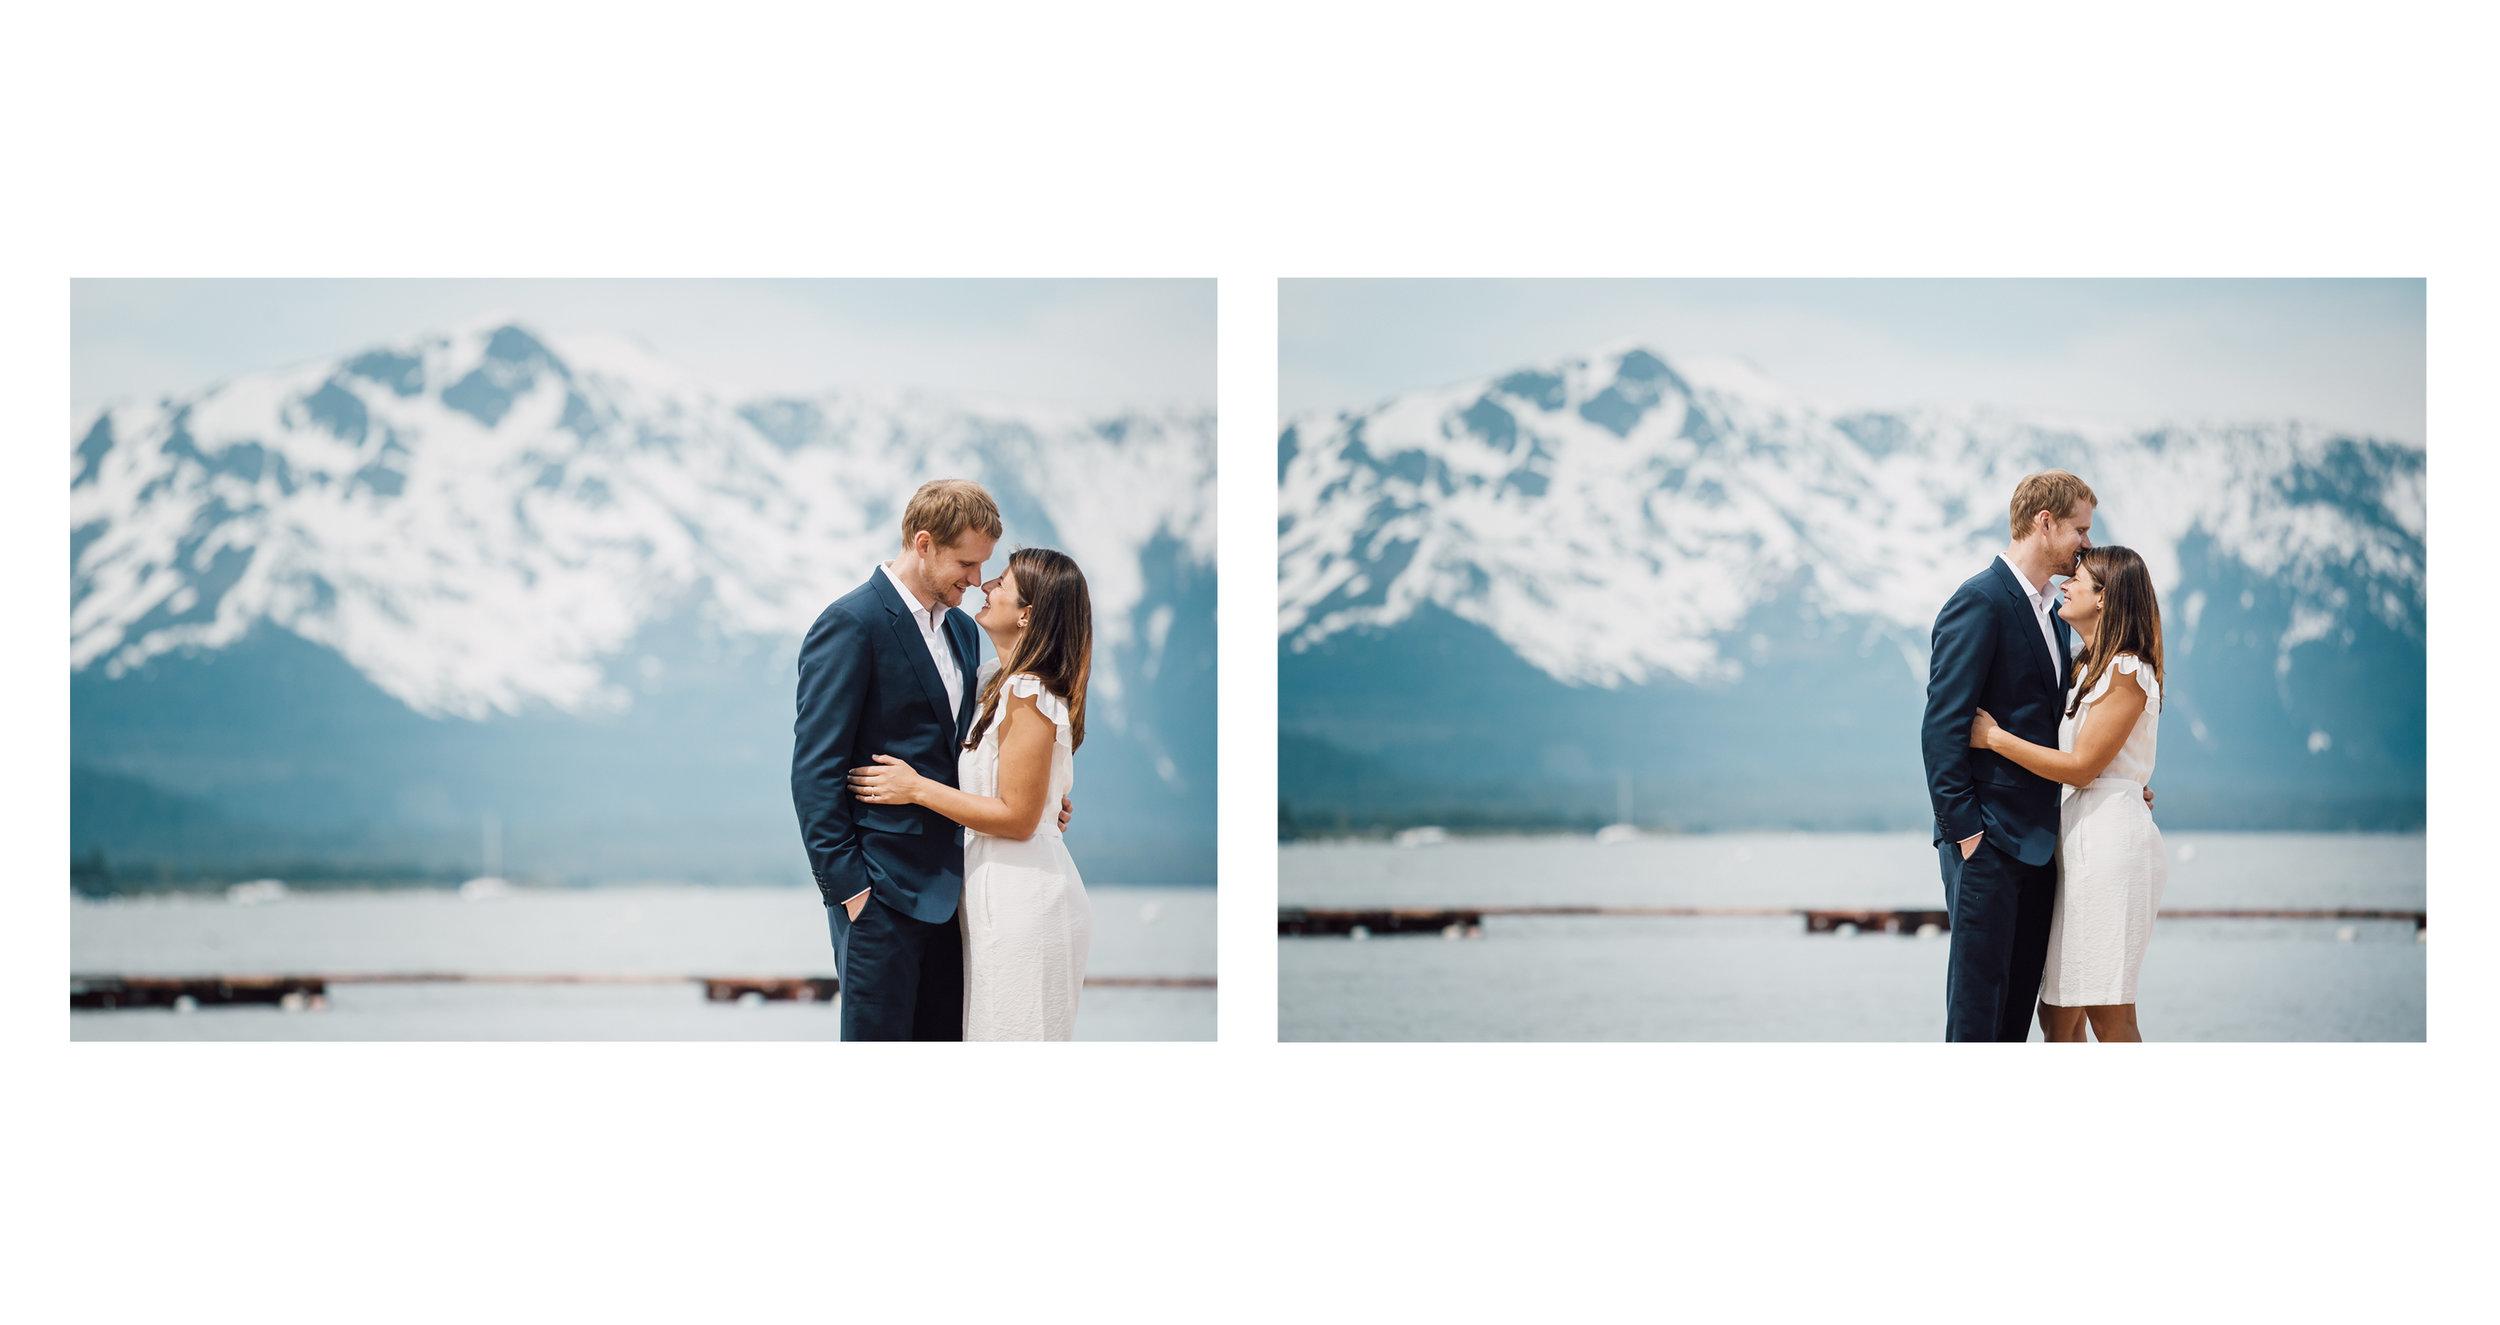 Melisa&David_Wedding_Day_002.jpg